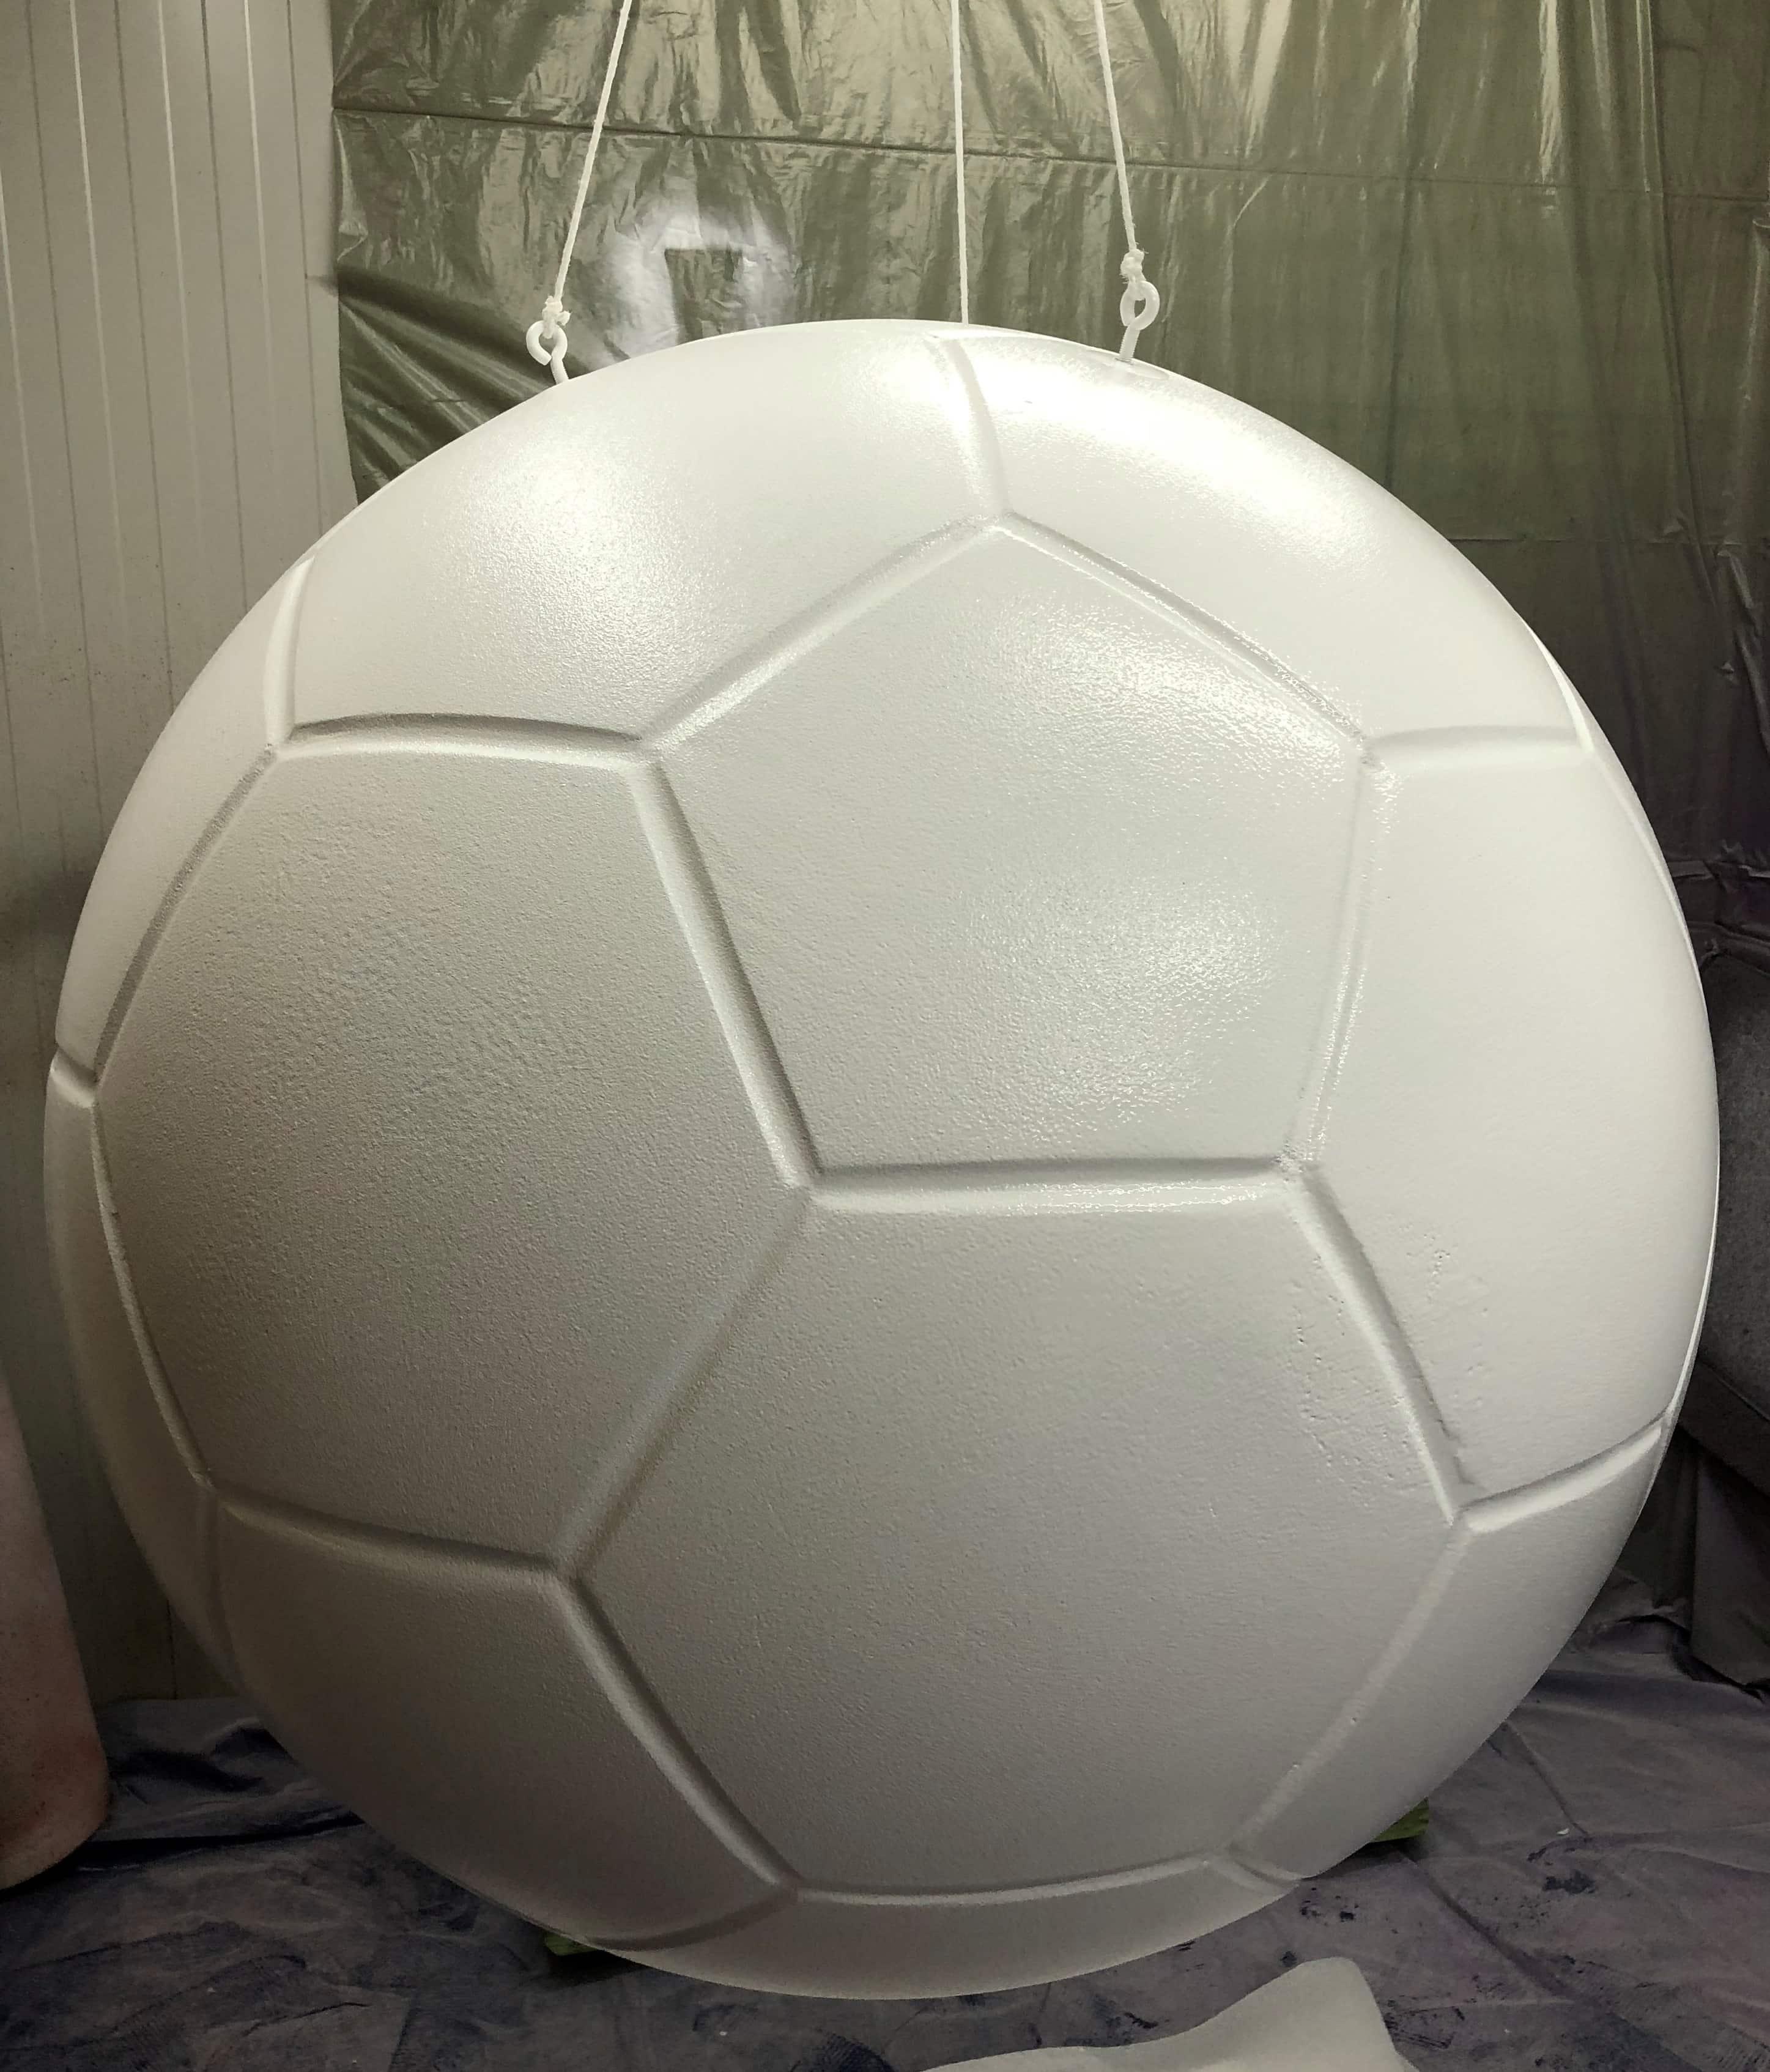 Piepschuim-bal-EPS-voetbal-04